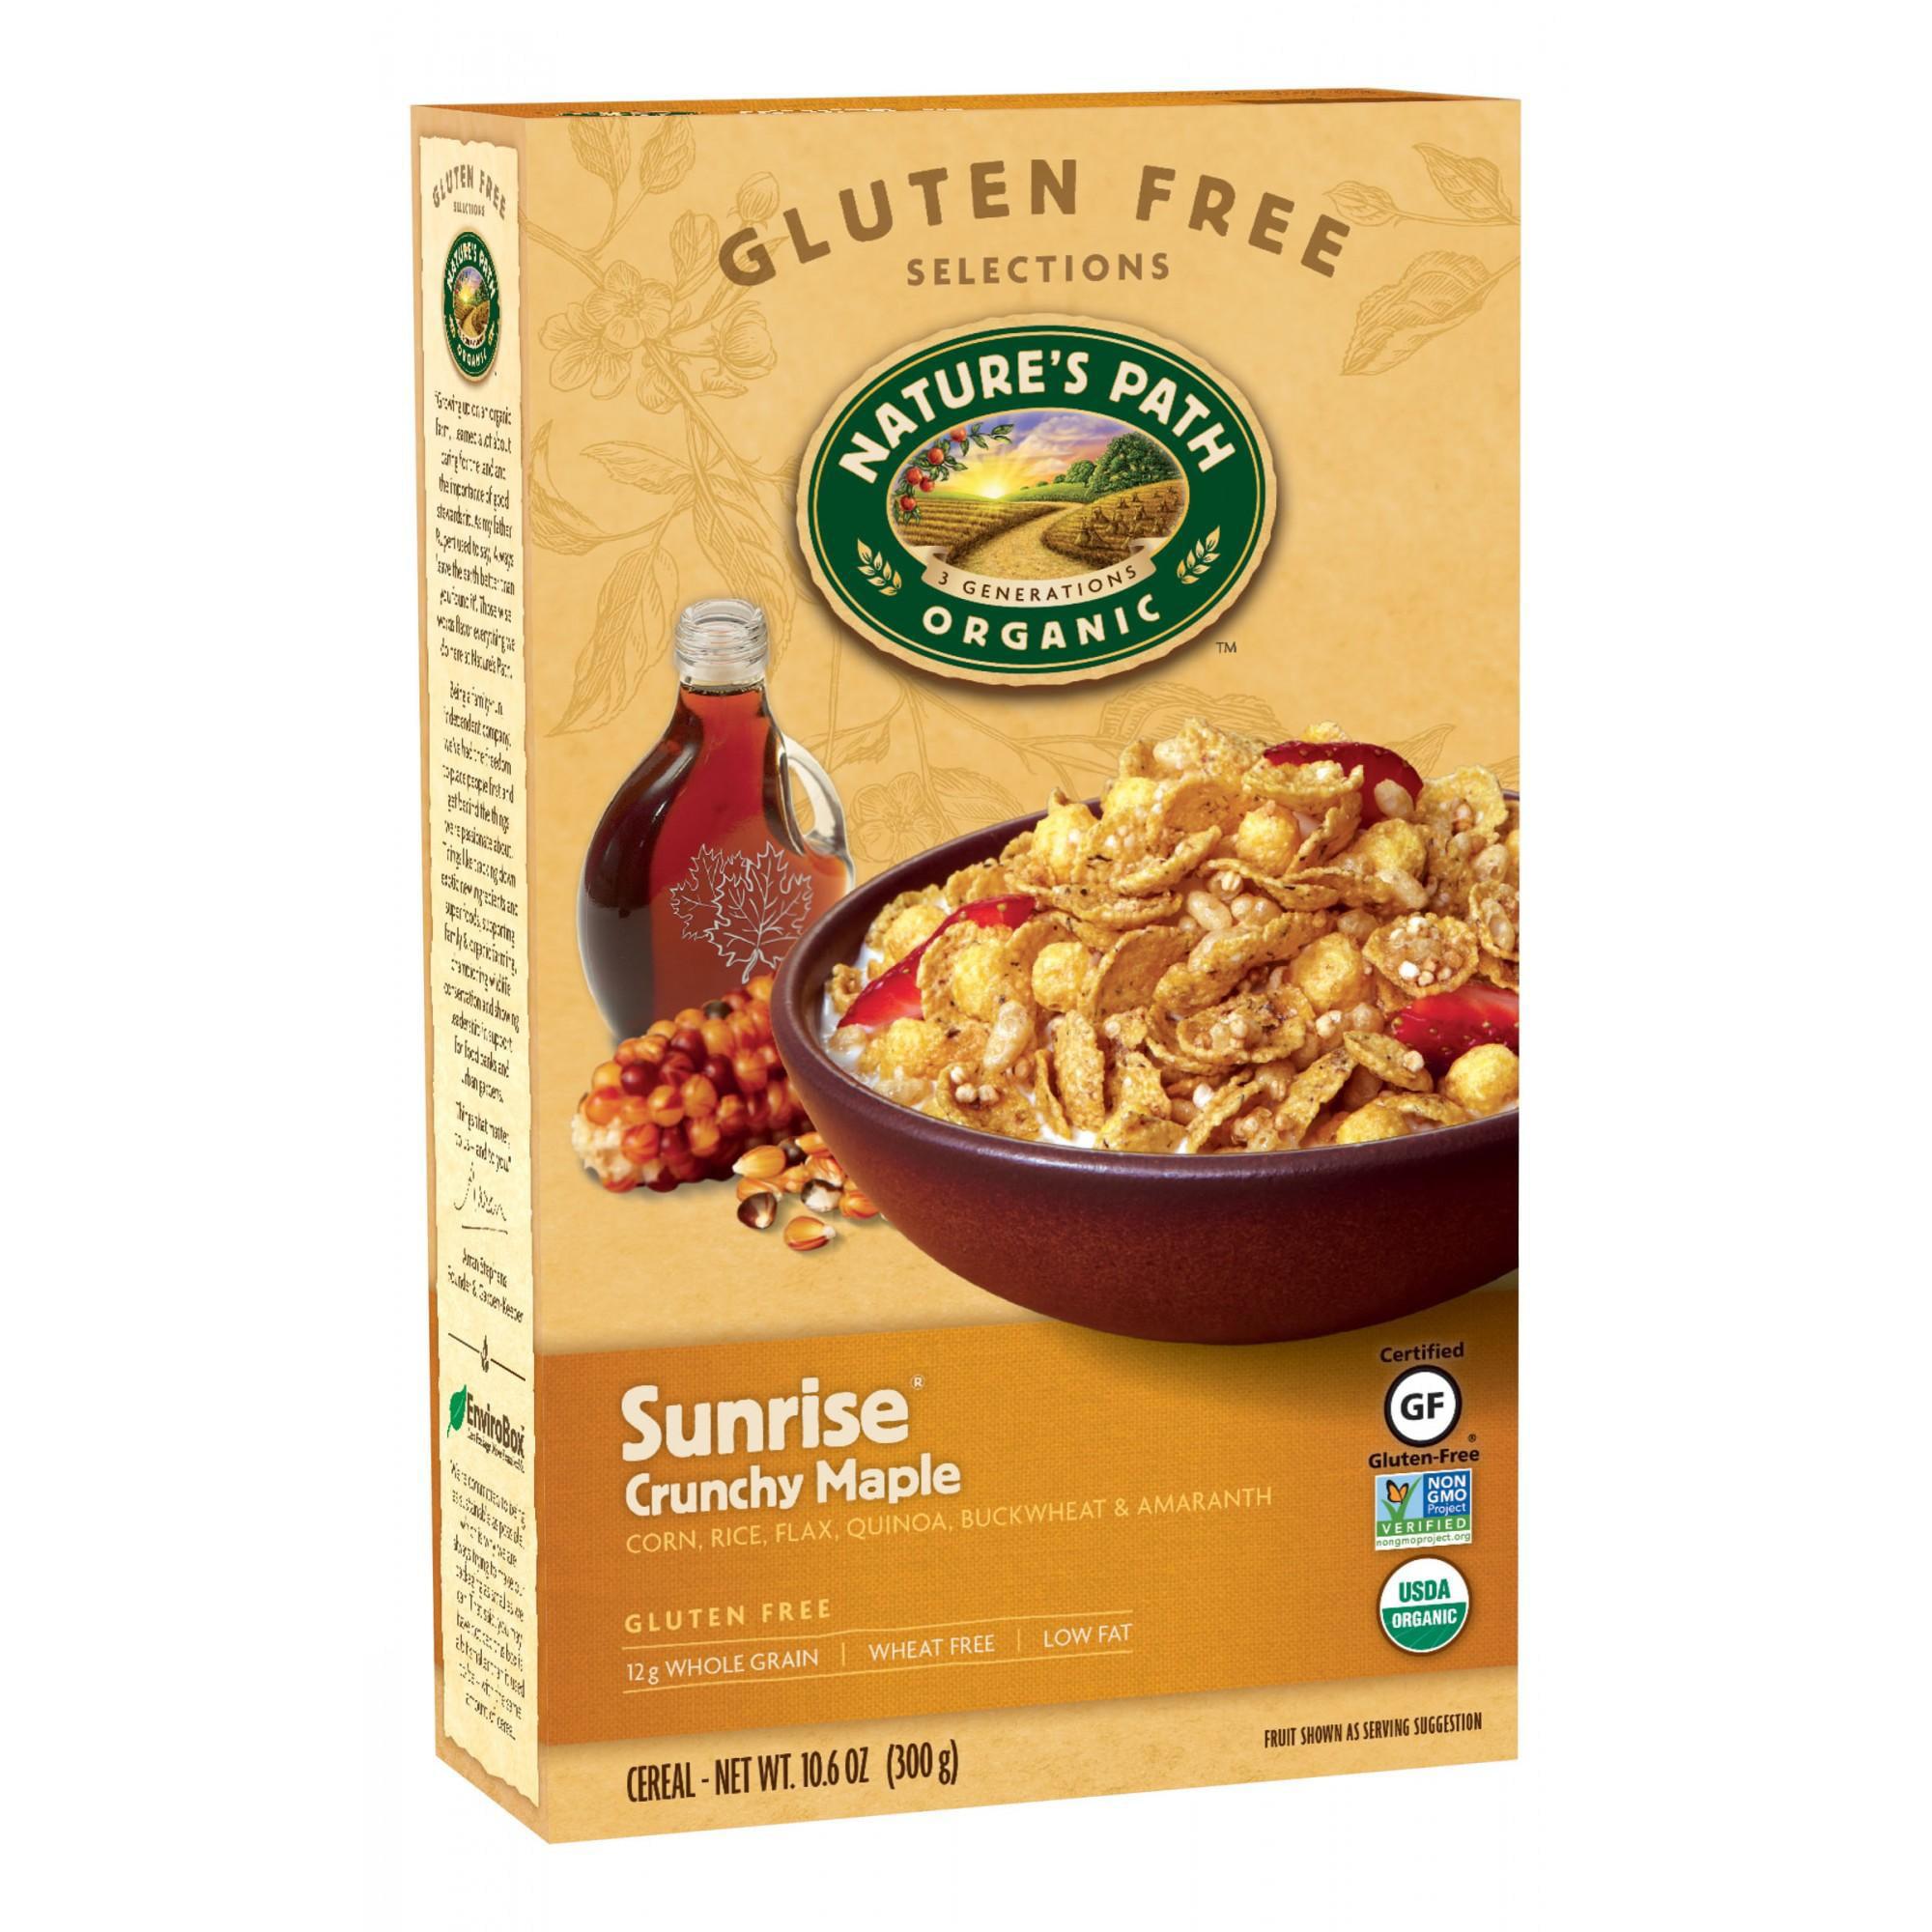 Nature's Path Organic Cereal, Gluten Free, Sunrise Crunchy Maple, 10.6 oz